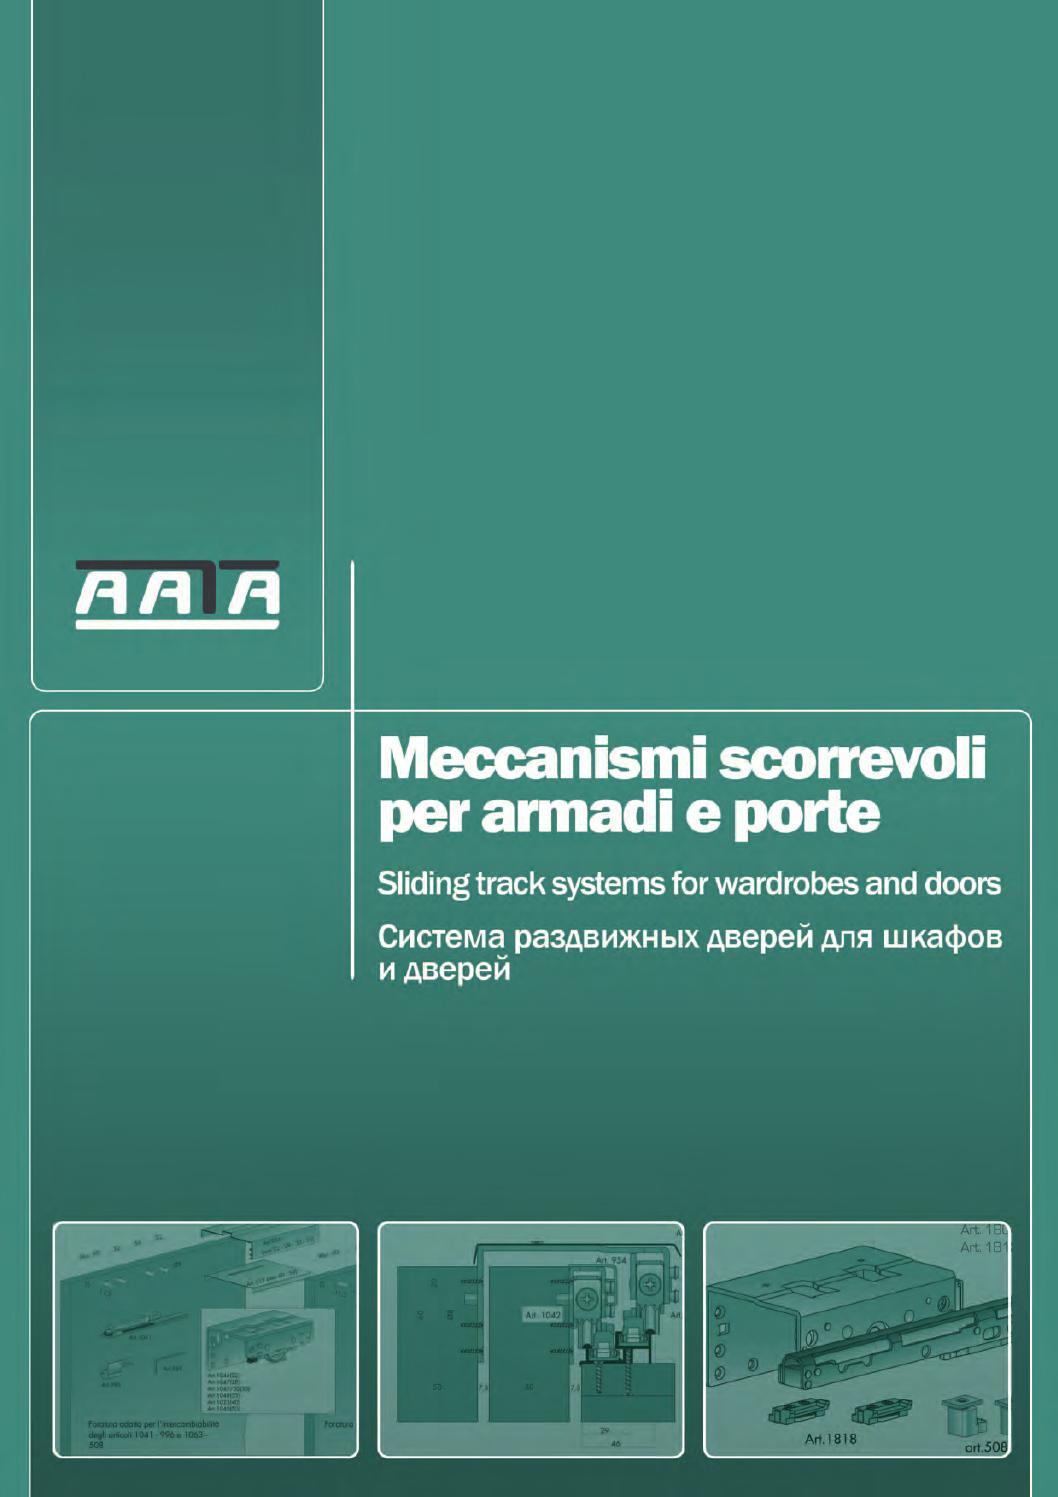 Aata scorrevoli web by Fabrizio De Maria Fbdm - issuu